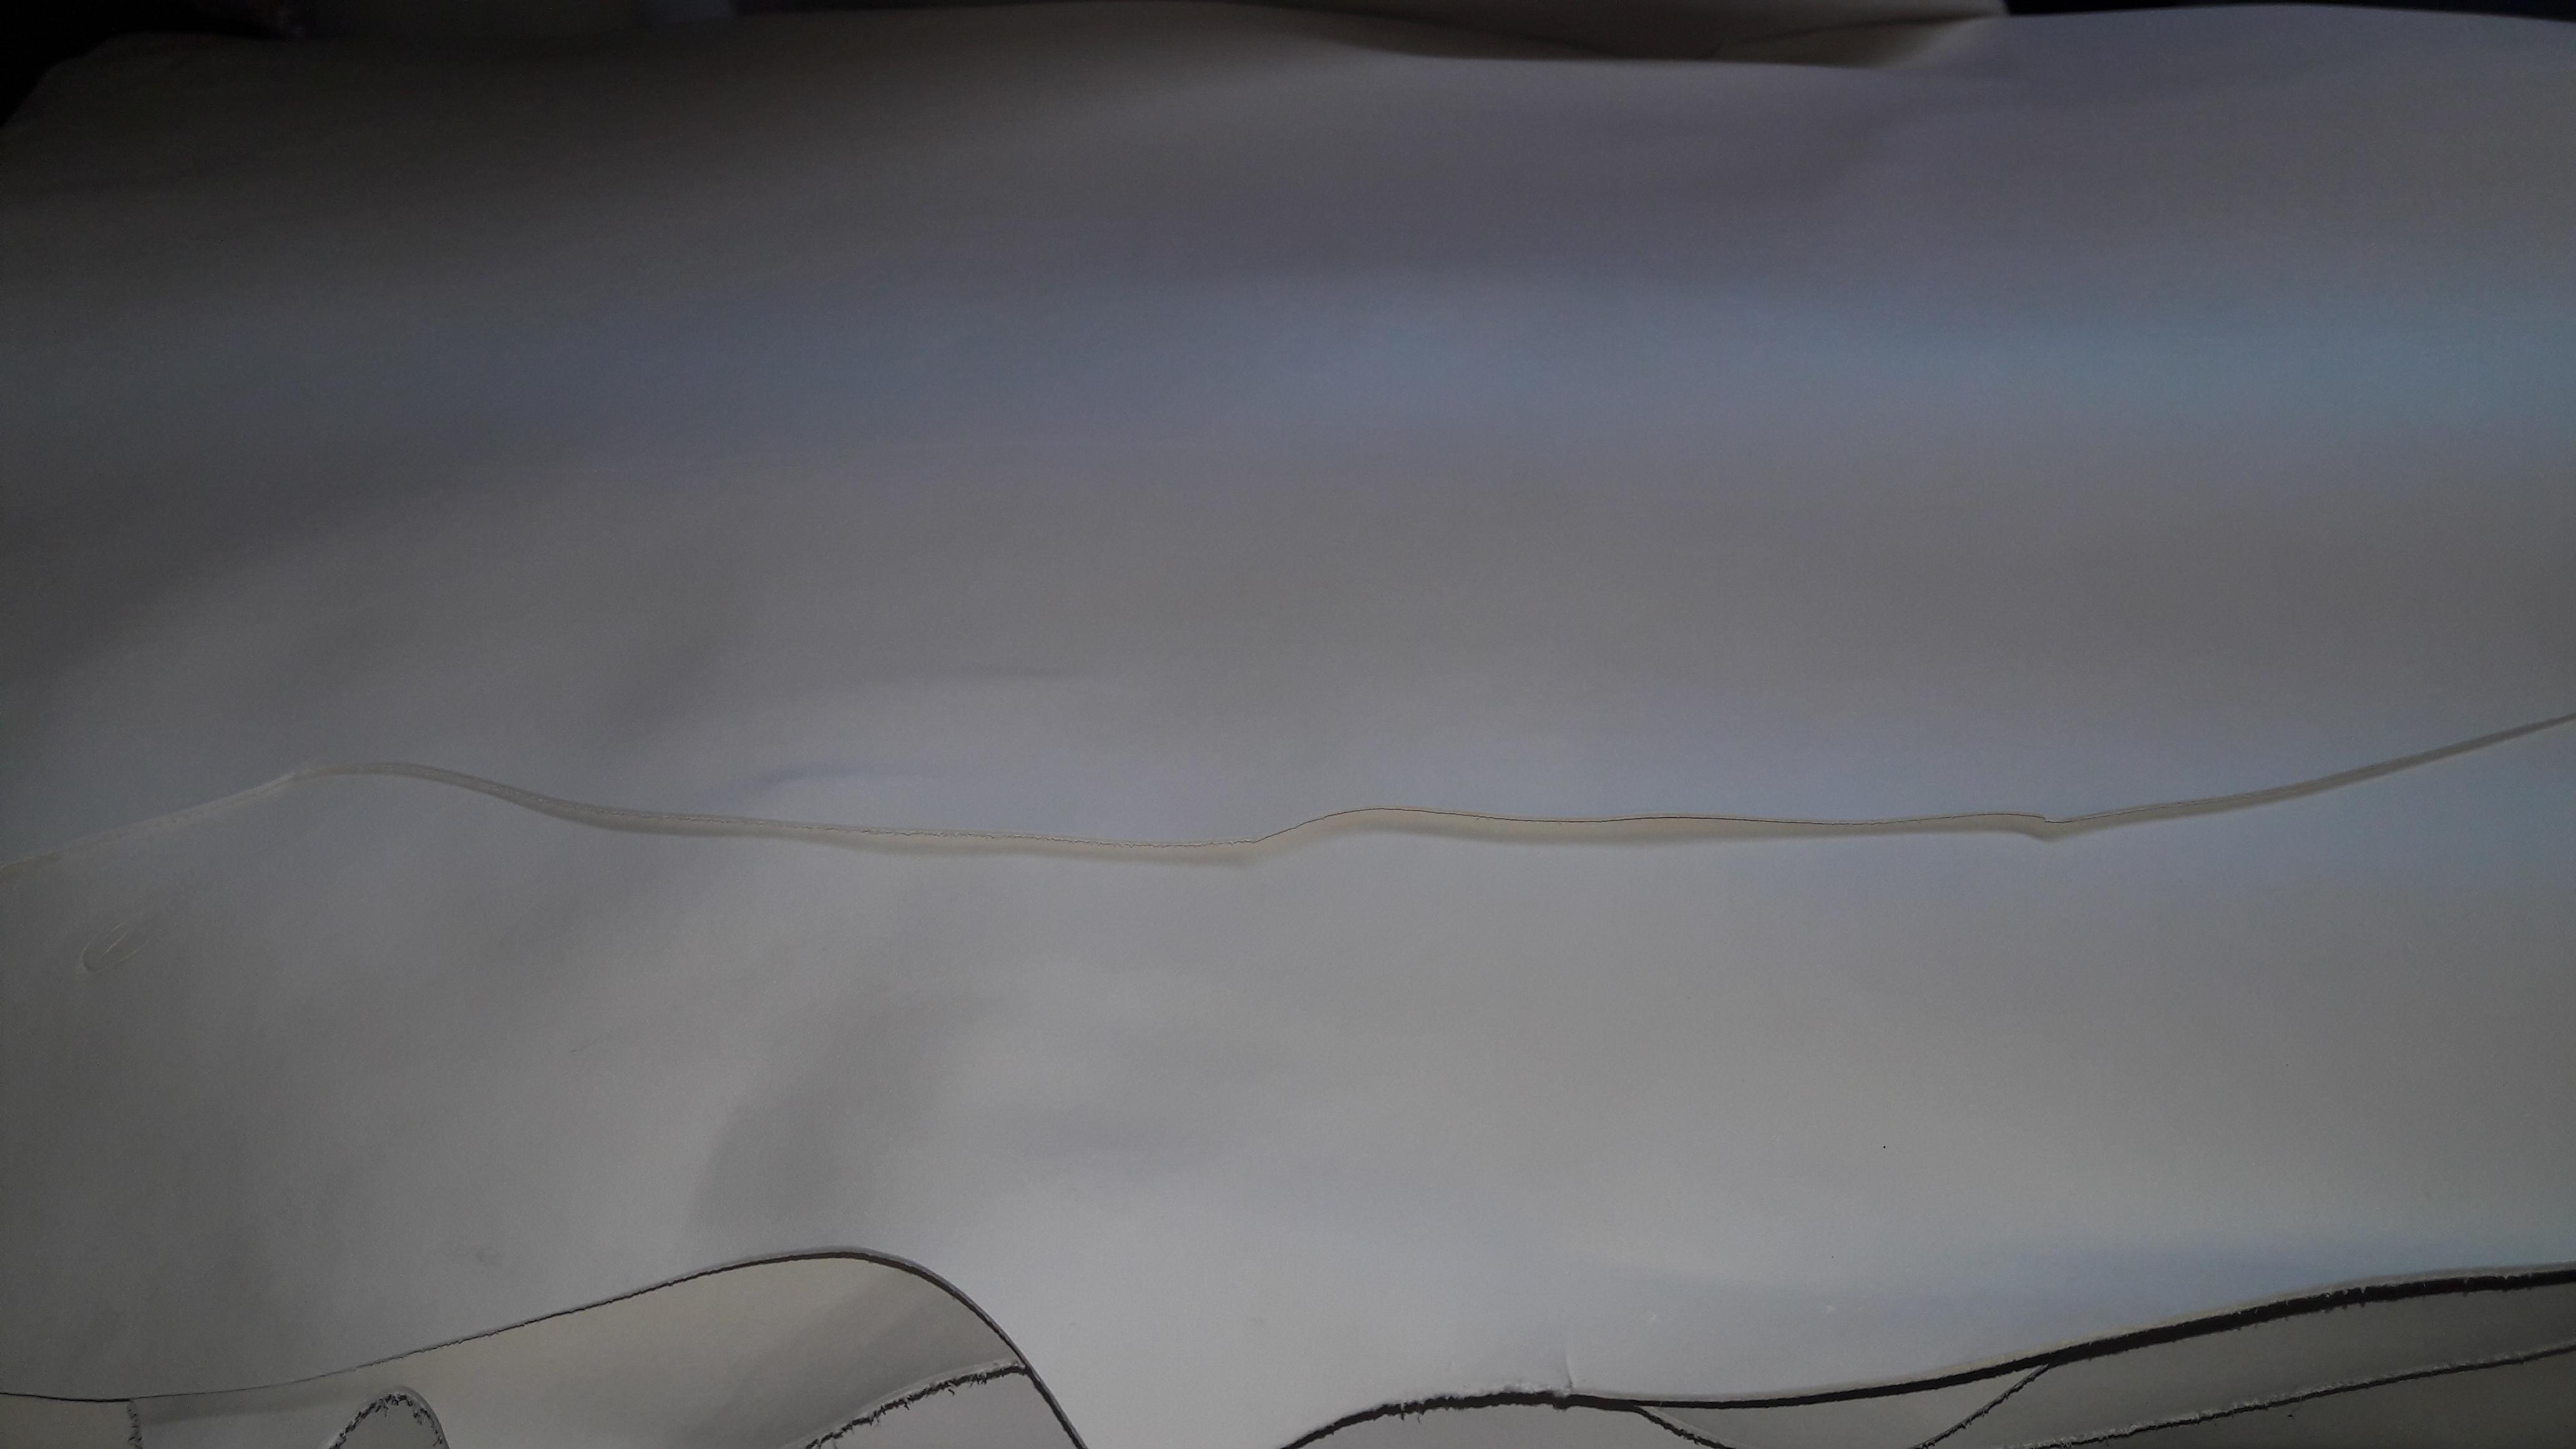 Chrome Free Bangladeshi Crust Leather